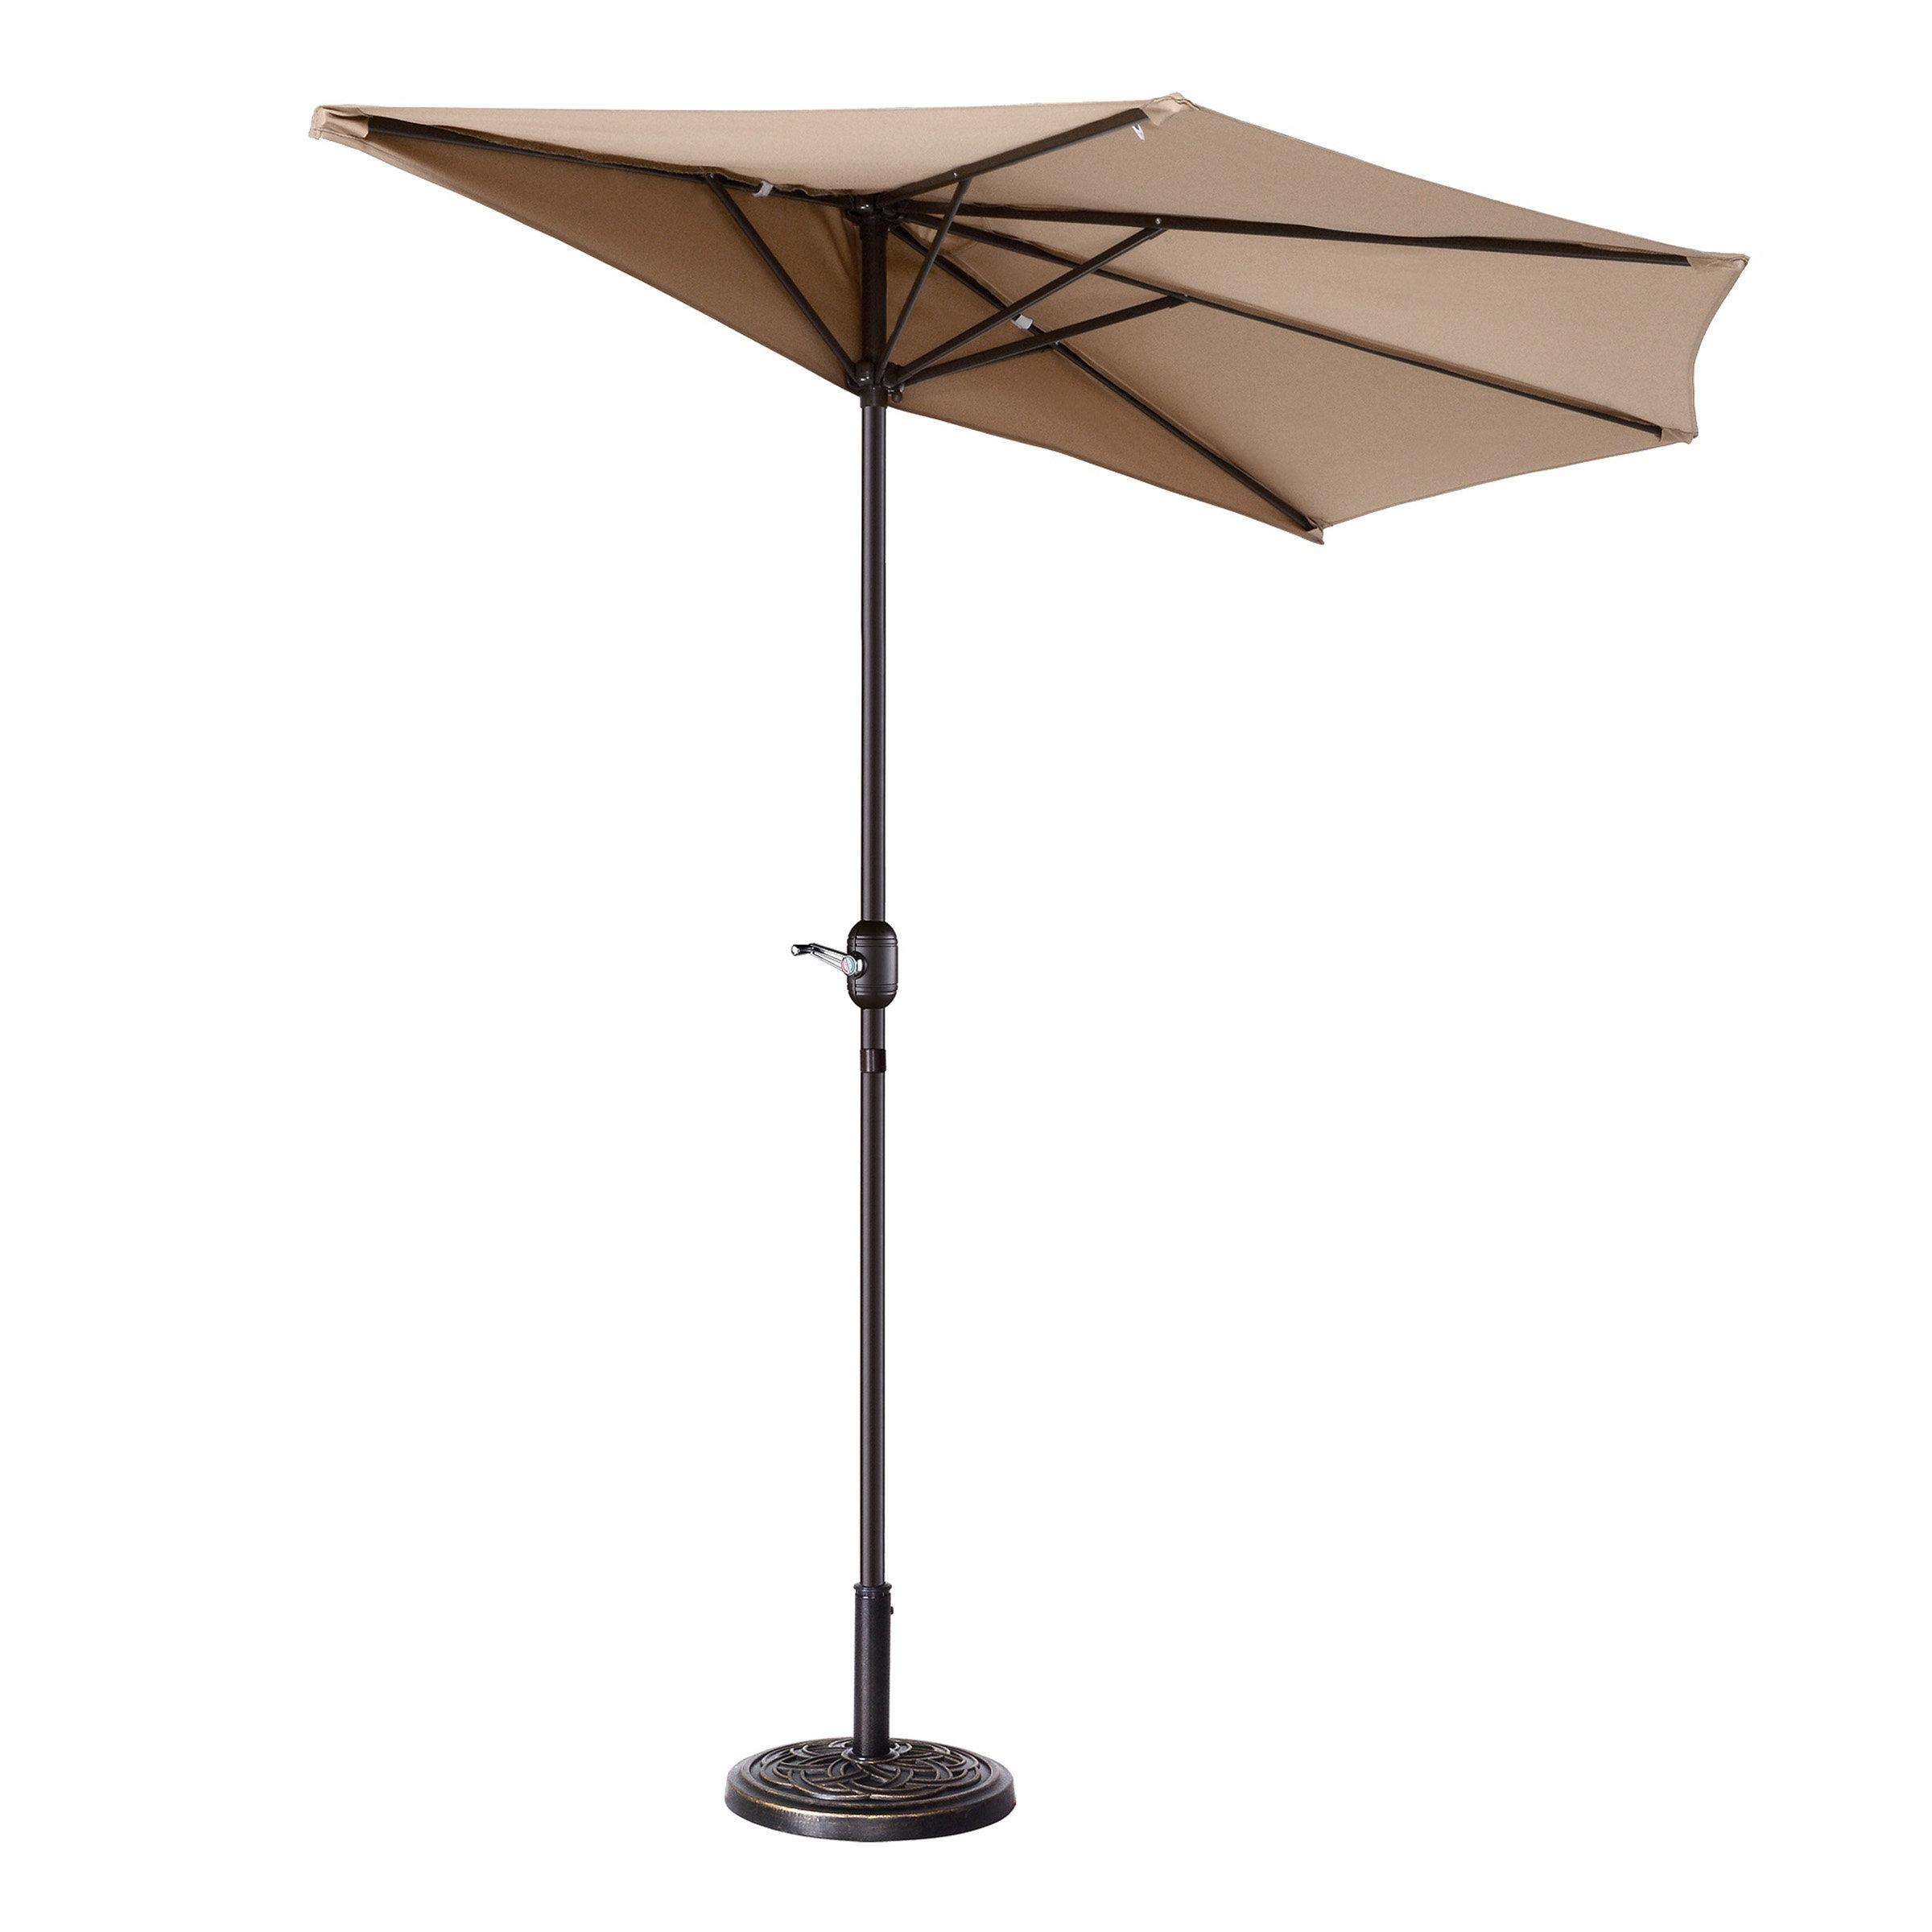 Sheehan Market Umbrellas In 2020 Colburn Half 9' Market Umbrella (View 11 of 20)